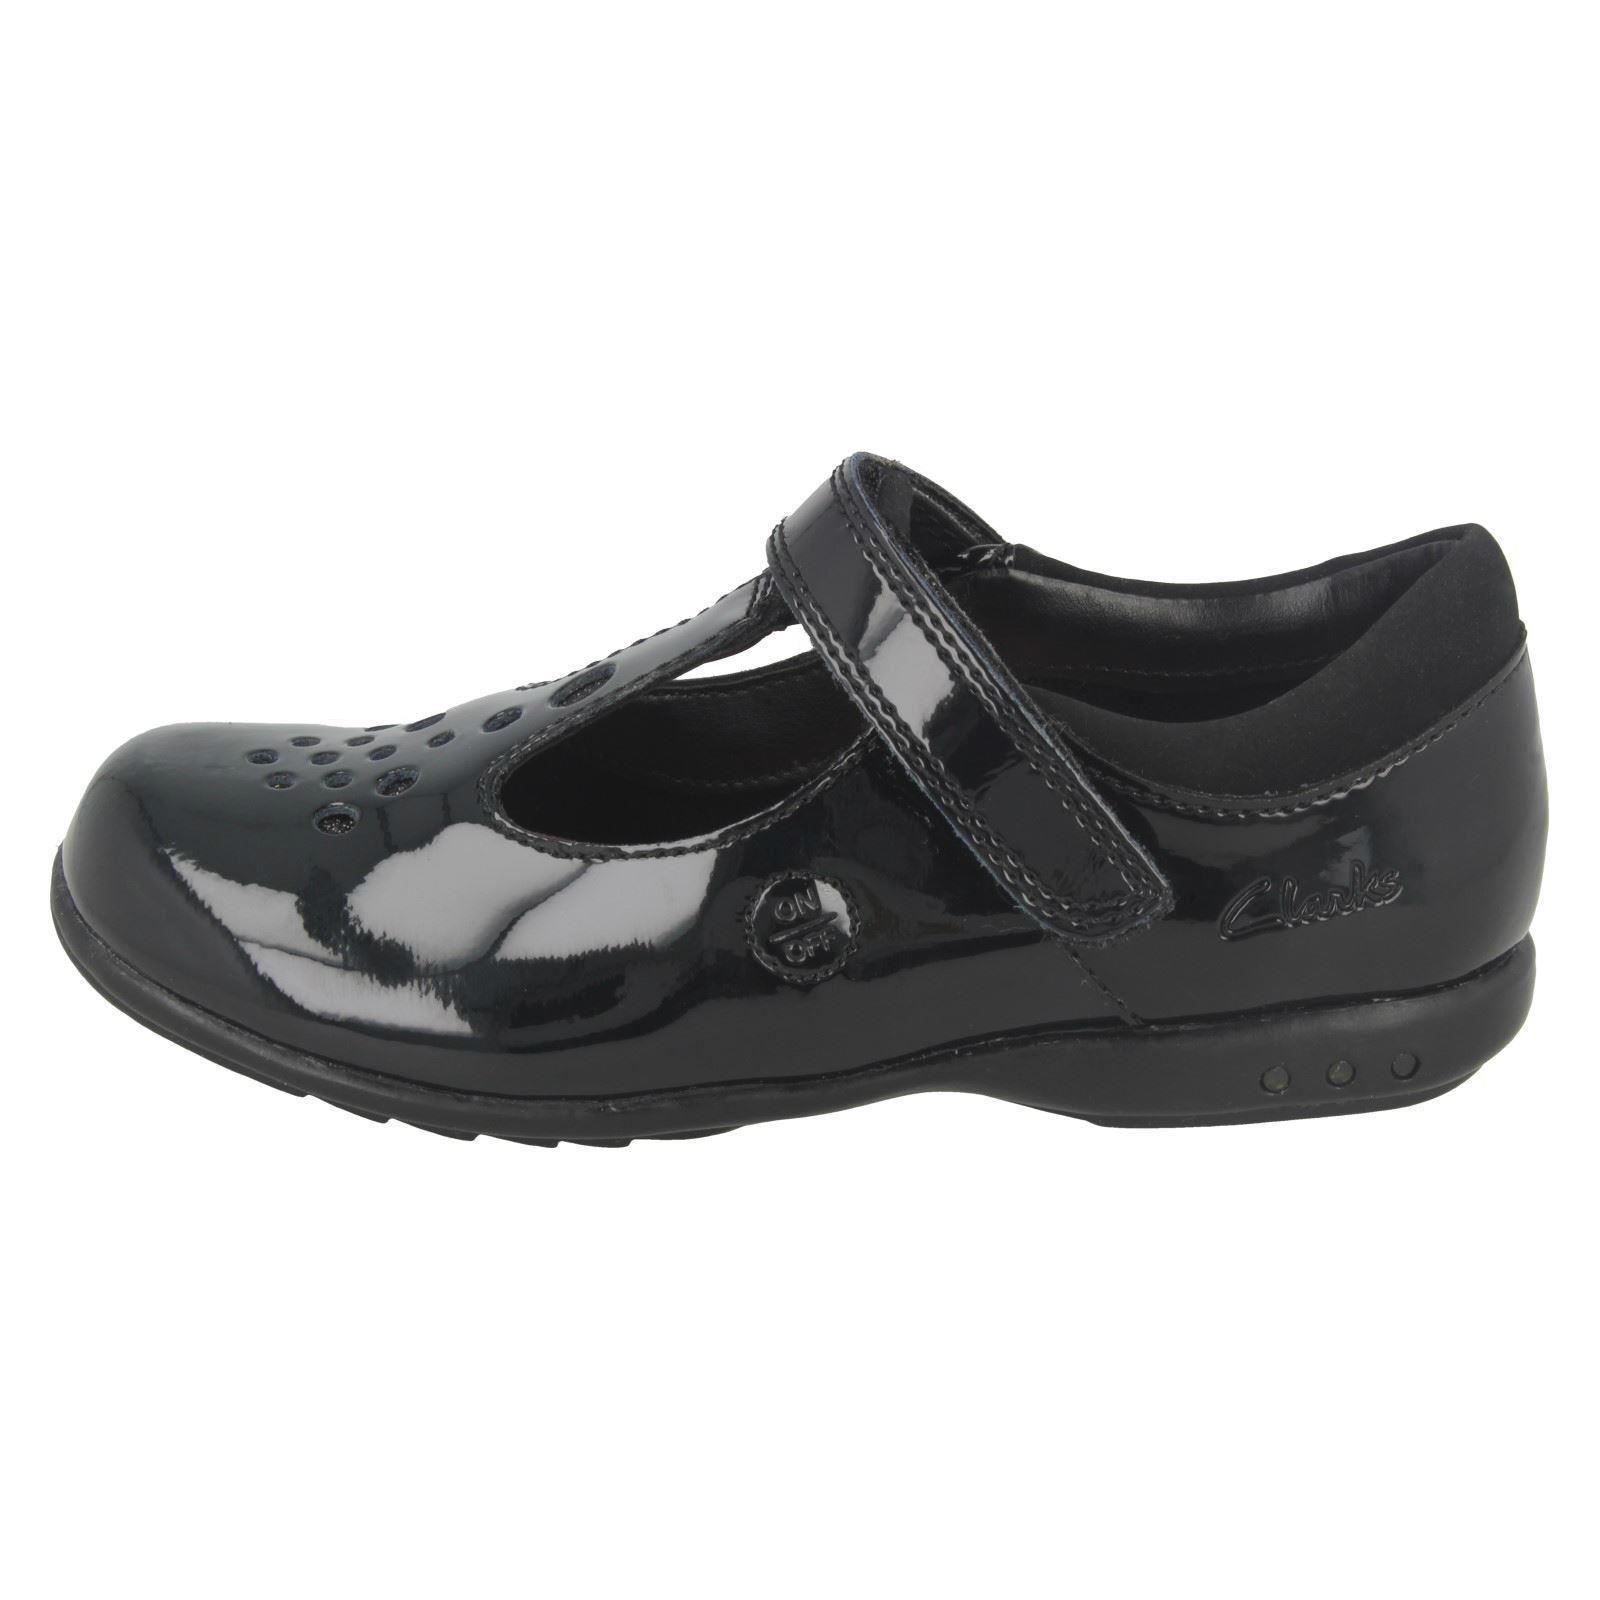 Clarks School Shoes Guarantee